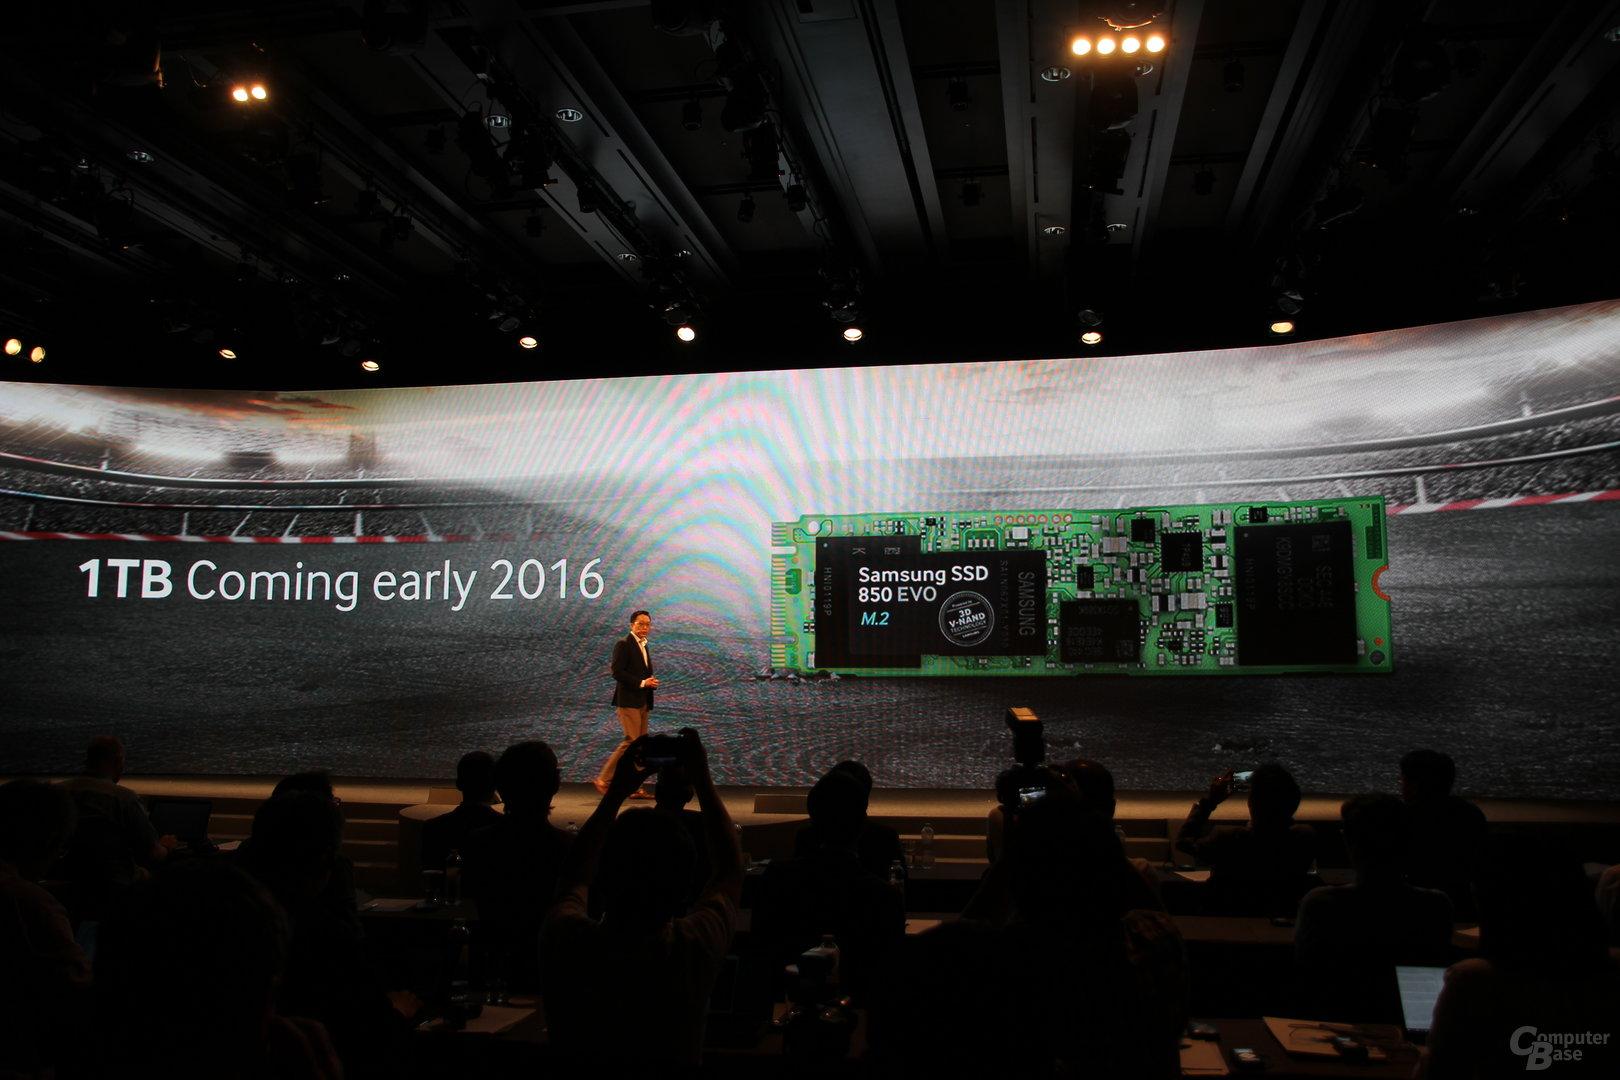 Samsung SSD Global Summit 2015